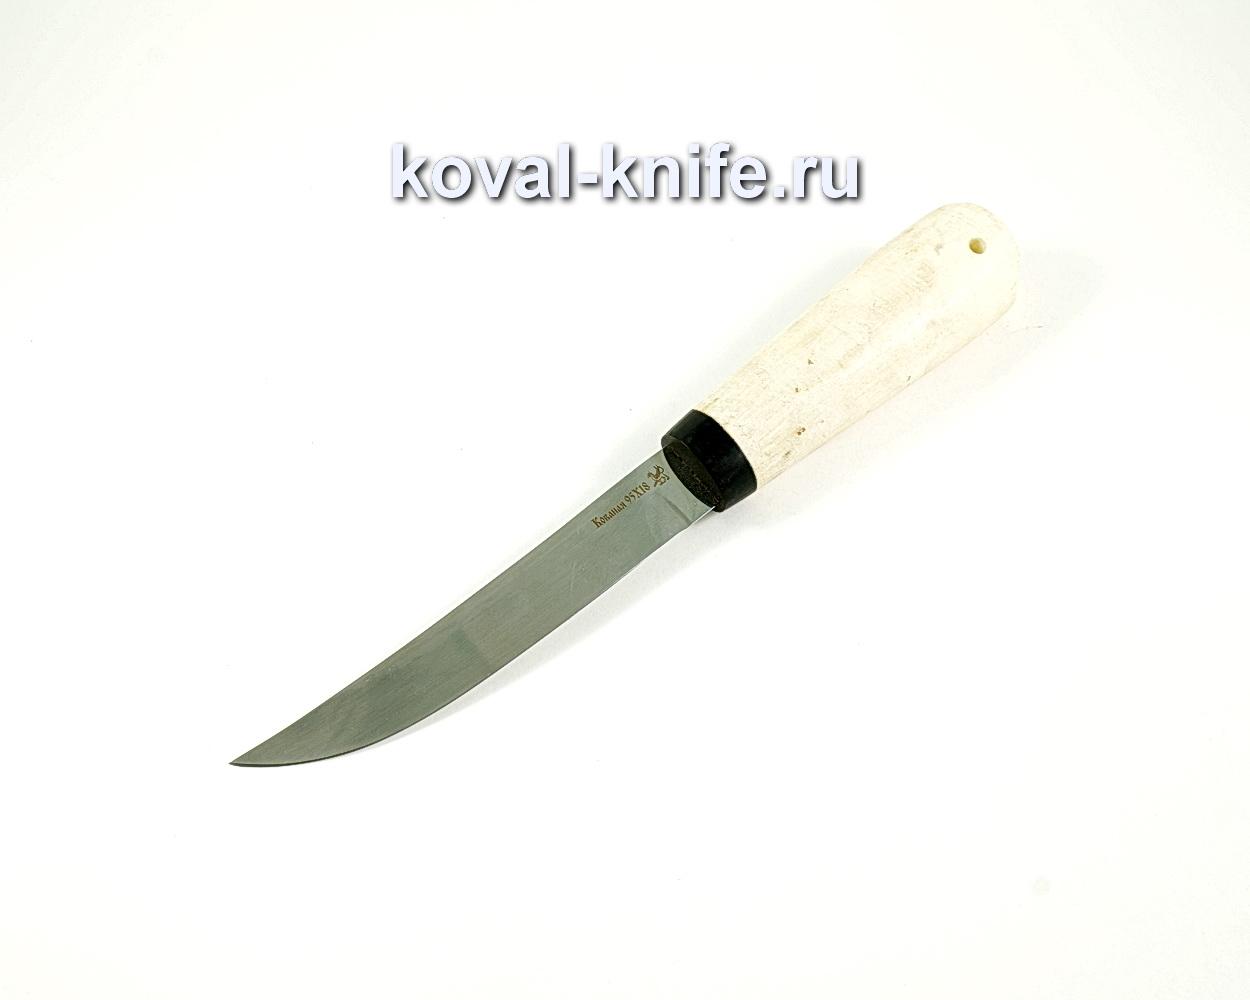 Нож Поплавок (сталь 95х18), рукоять пенопласт A211